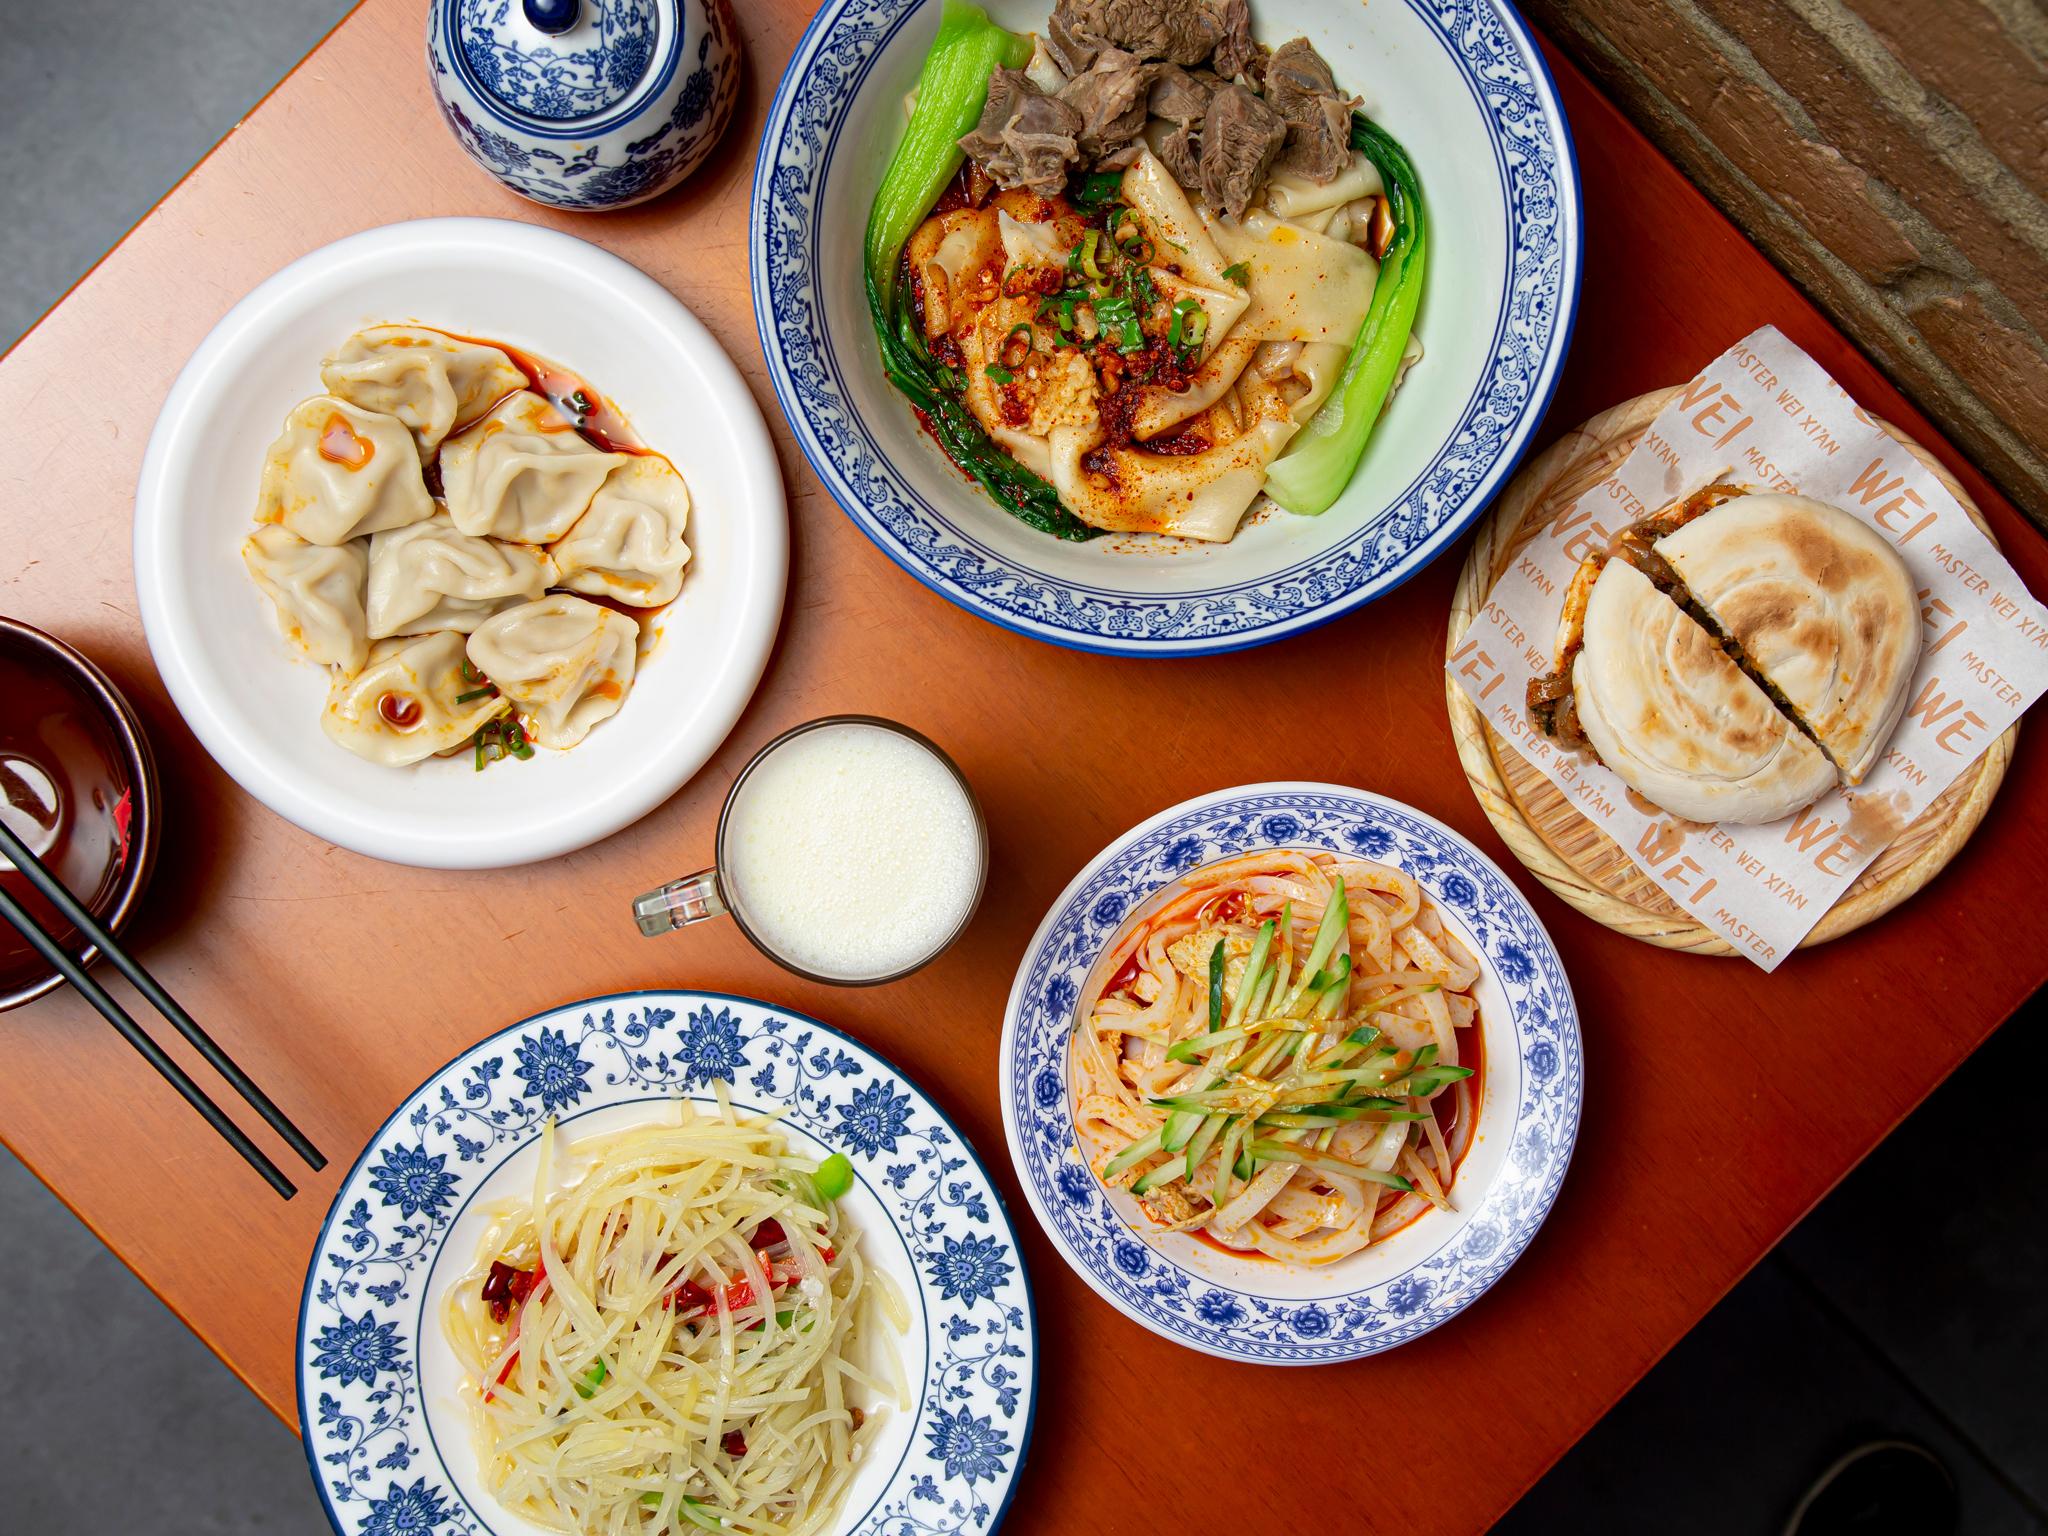 Restaurant of the week: Master Wei